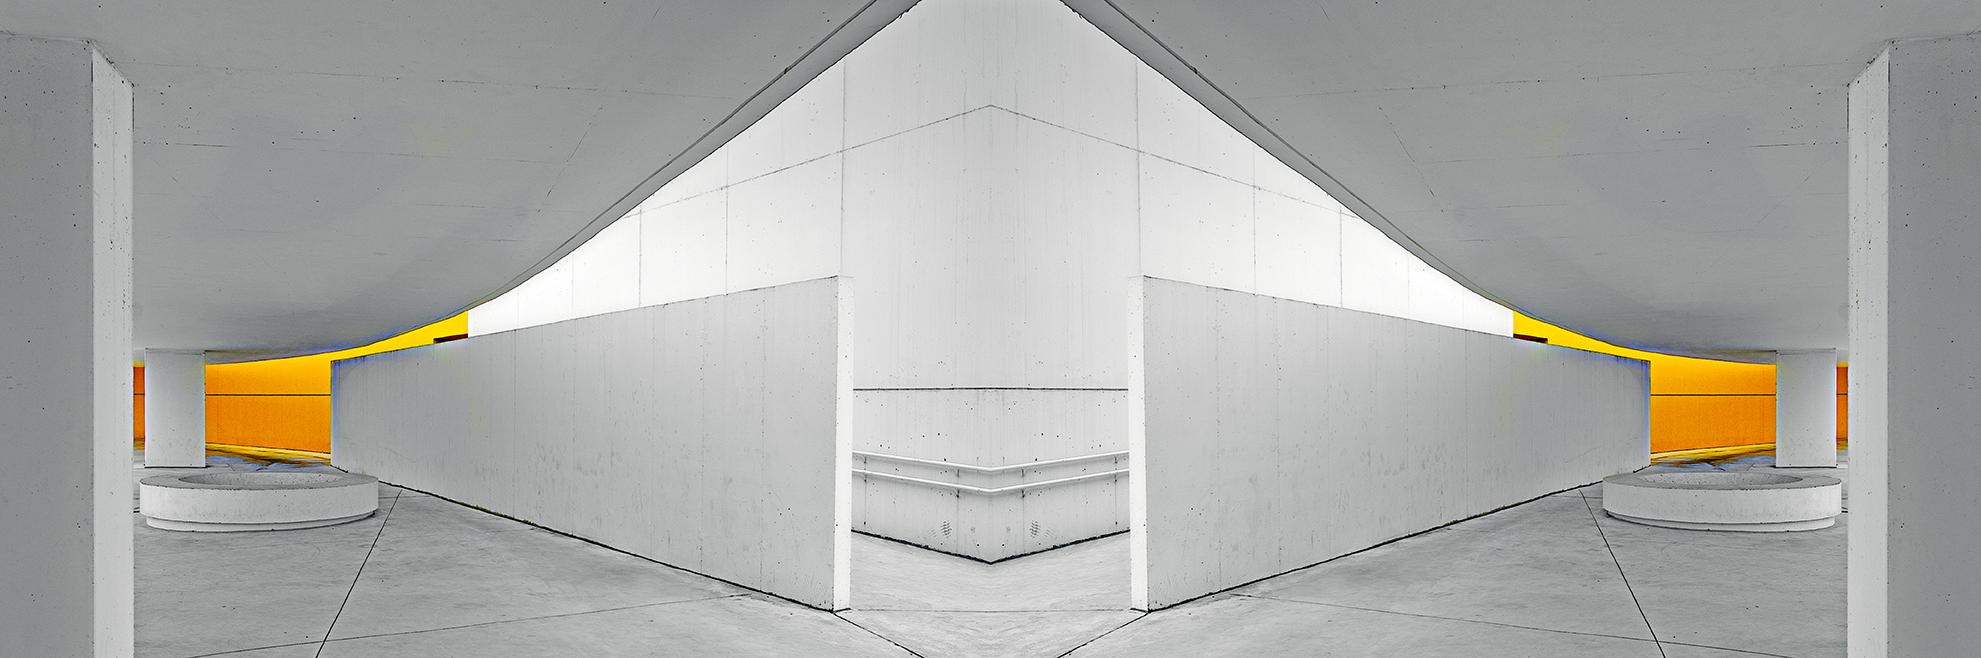 CCN / Avilés (E) - Arquitecturas - Urbano Suárez,  FineArt Photography